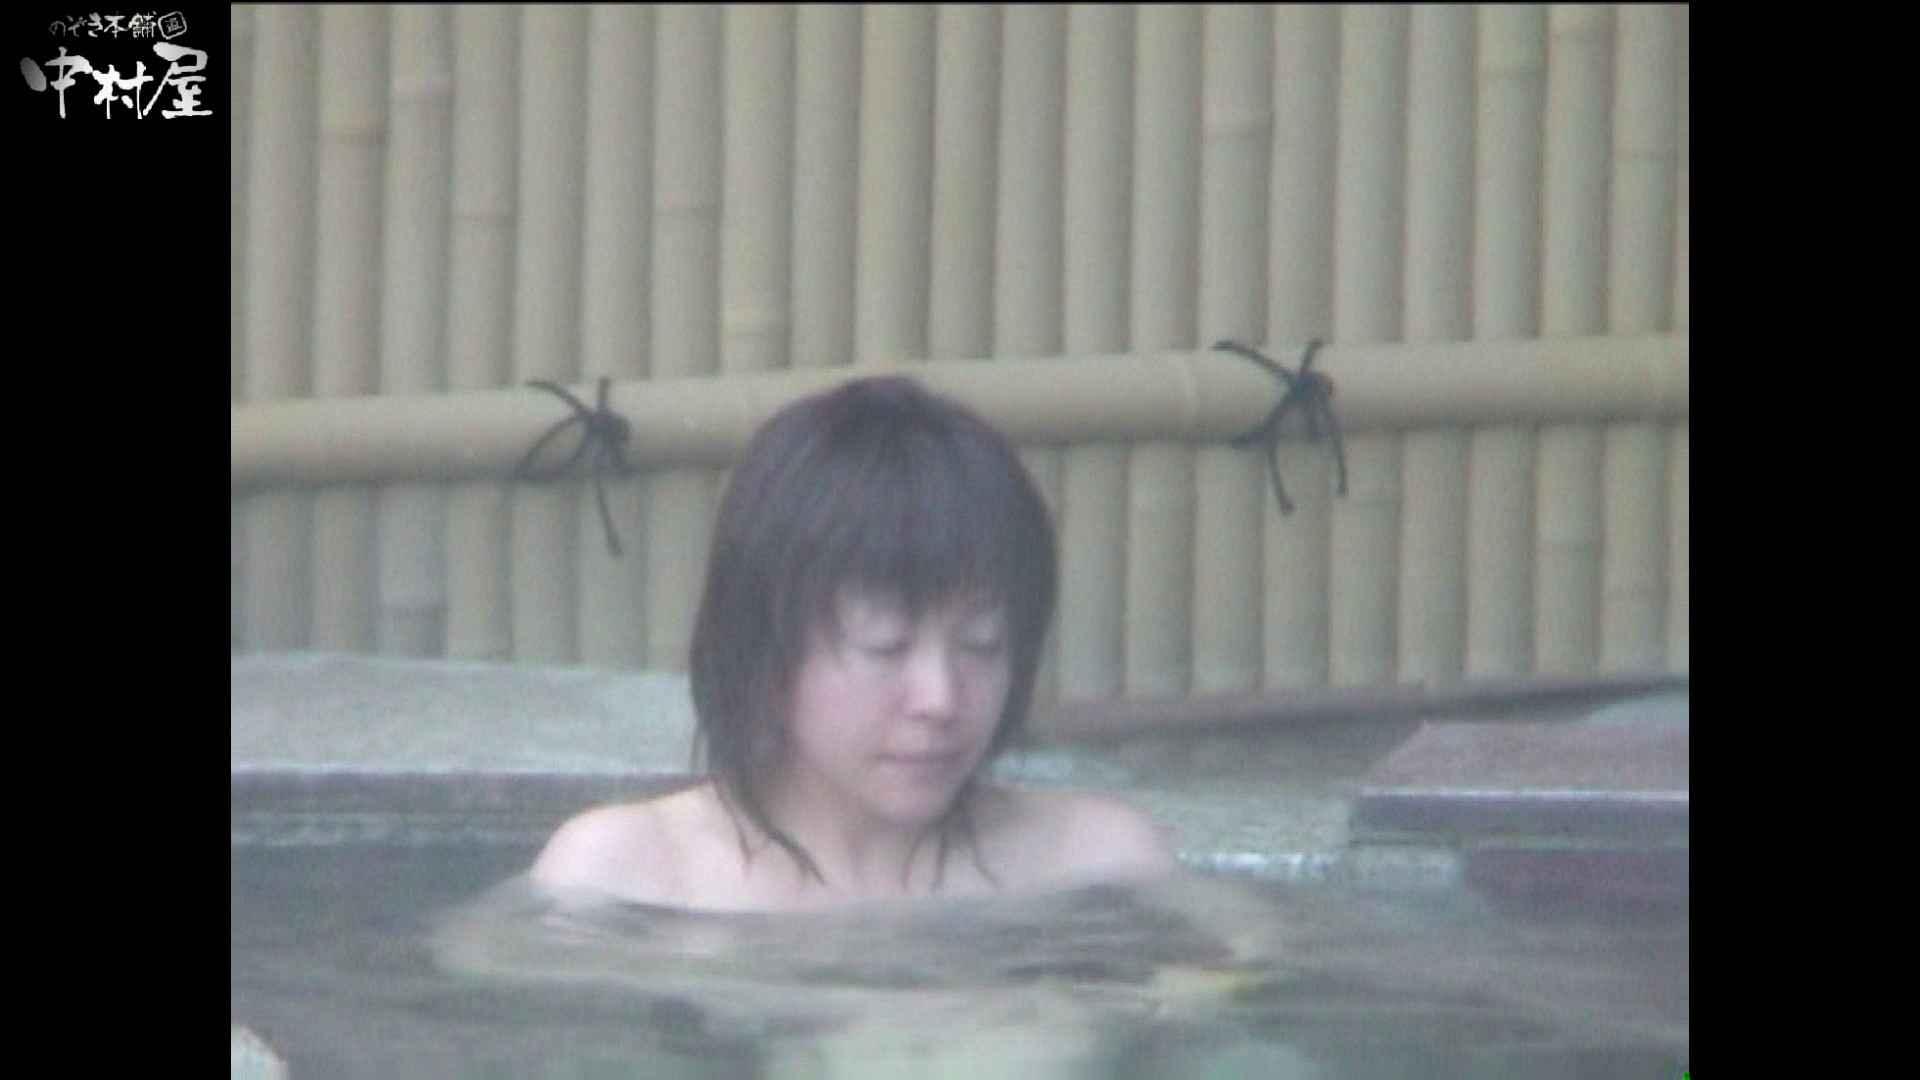 Aquaな露天風呂Vol.985 盗撮 おまんこ動画流出 50画像 2